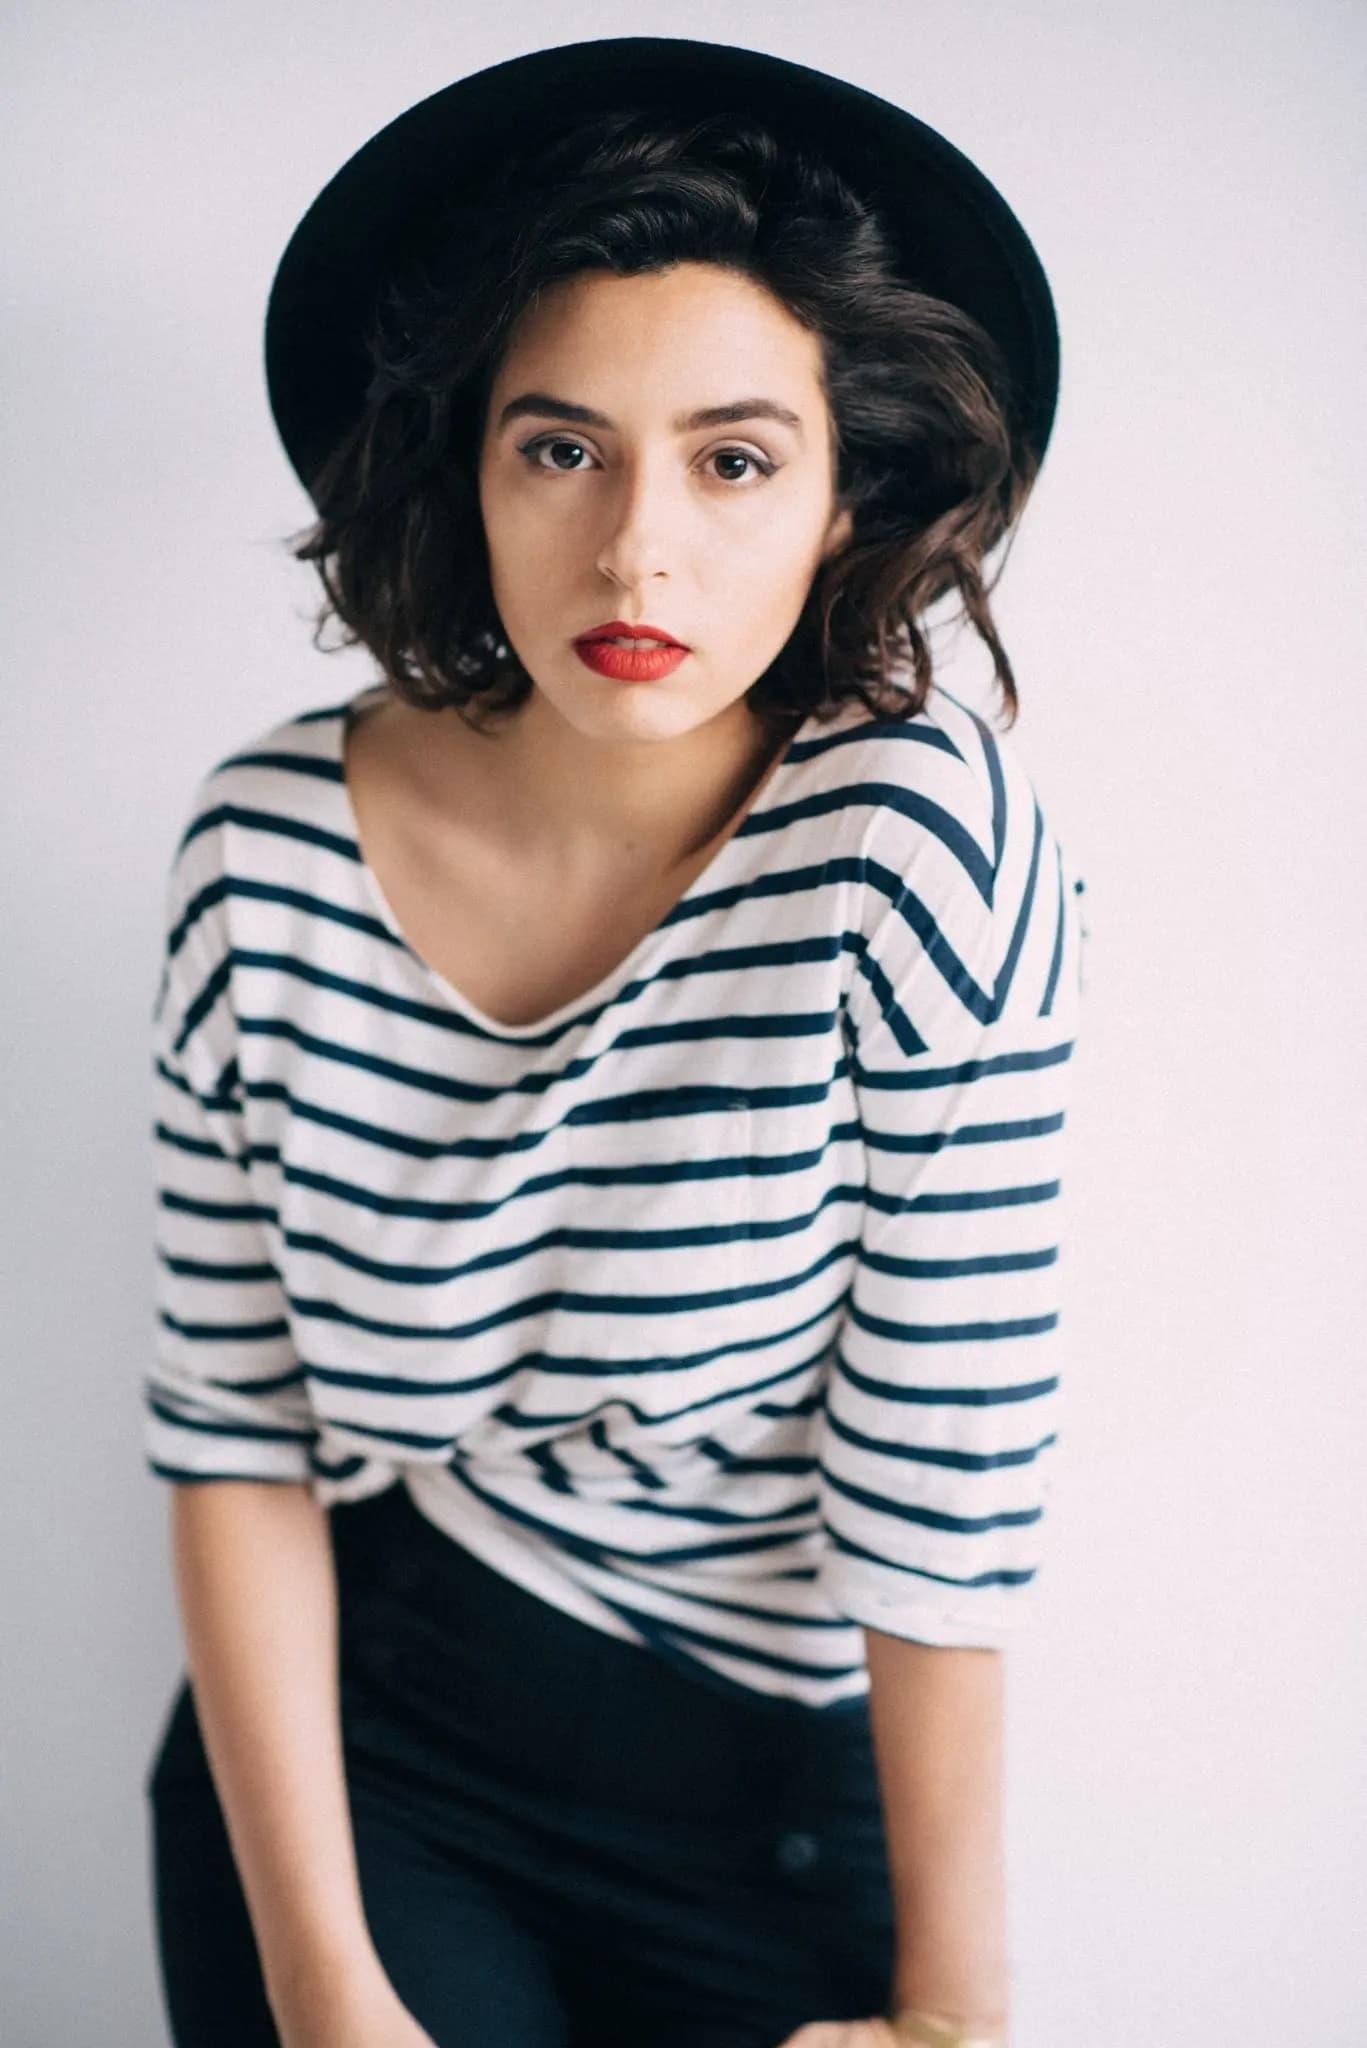 Sara Abdulrahman